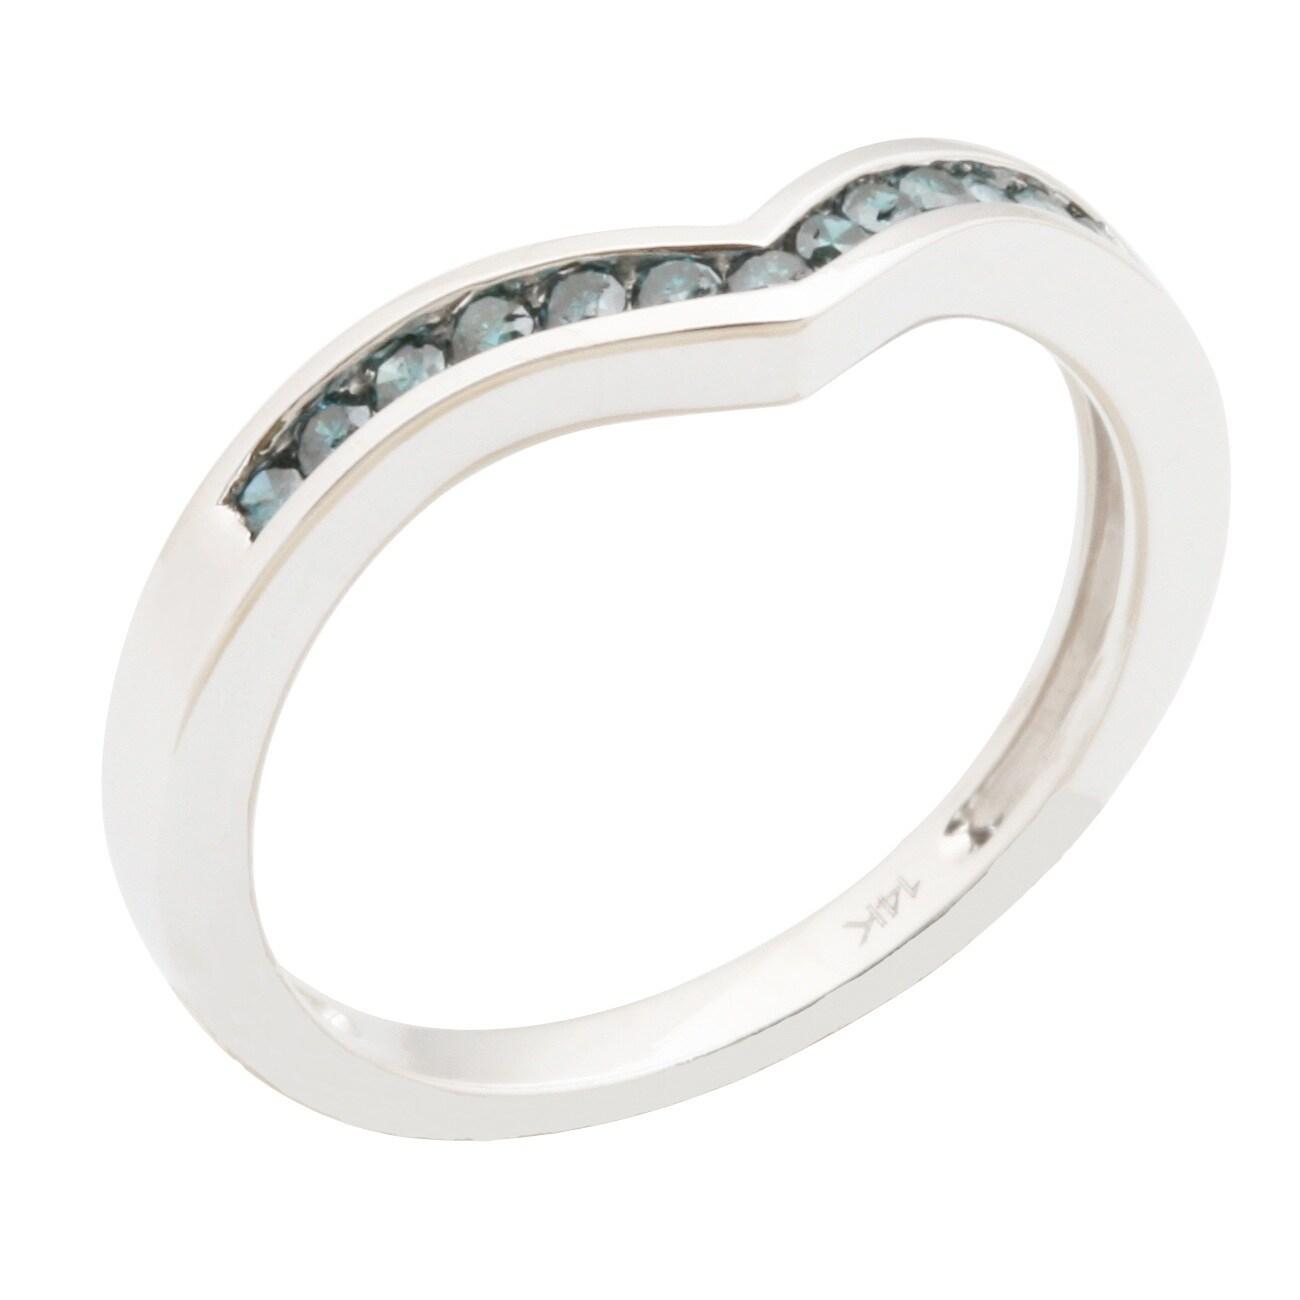 0.25 Carat Channel Set Blue Diamond Wishbone Anniversary Ring - Thumbnail 0